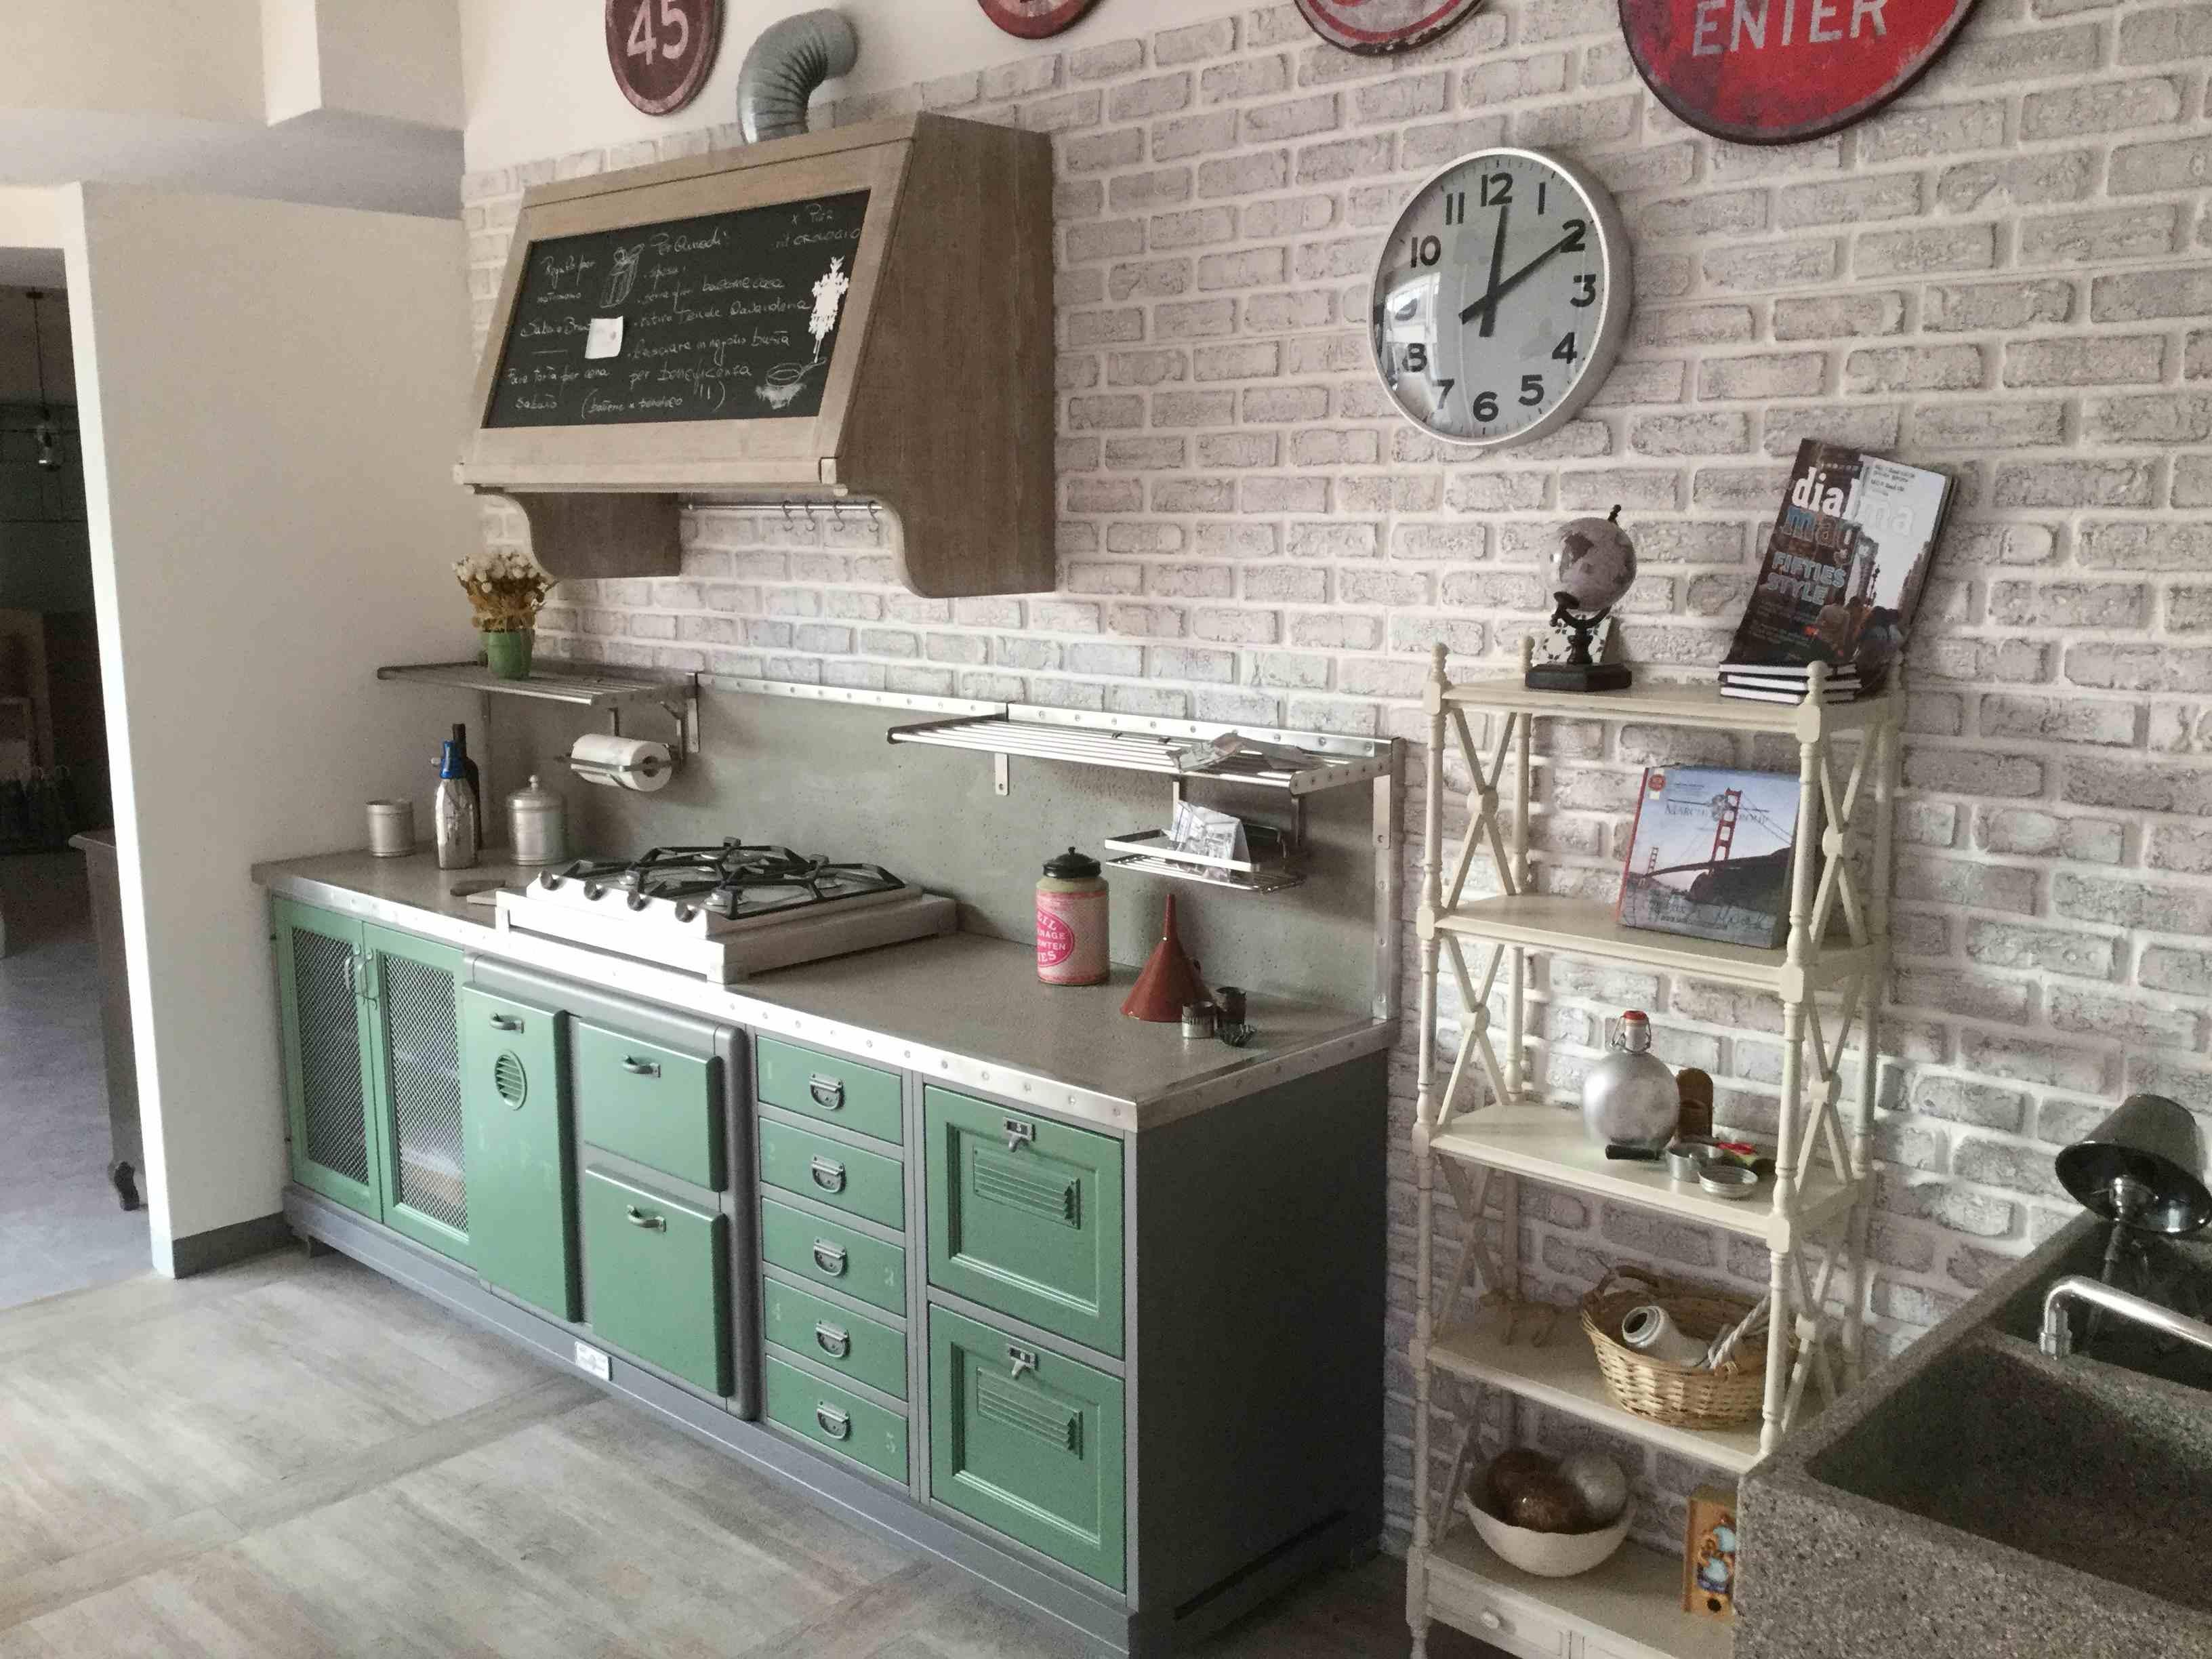 Marchi cucine cucina loft scontato del 50 cucine a - Marchi cucine outlet ...